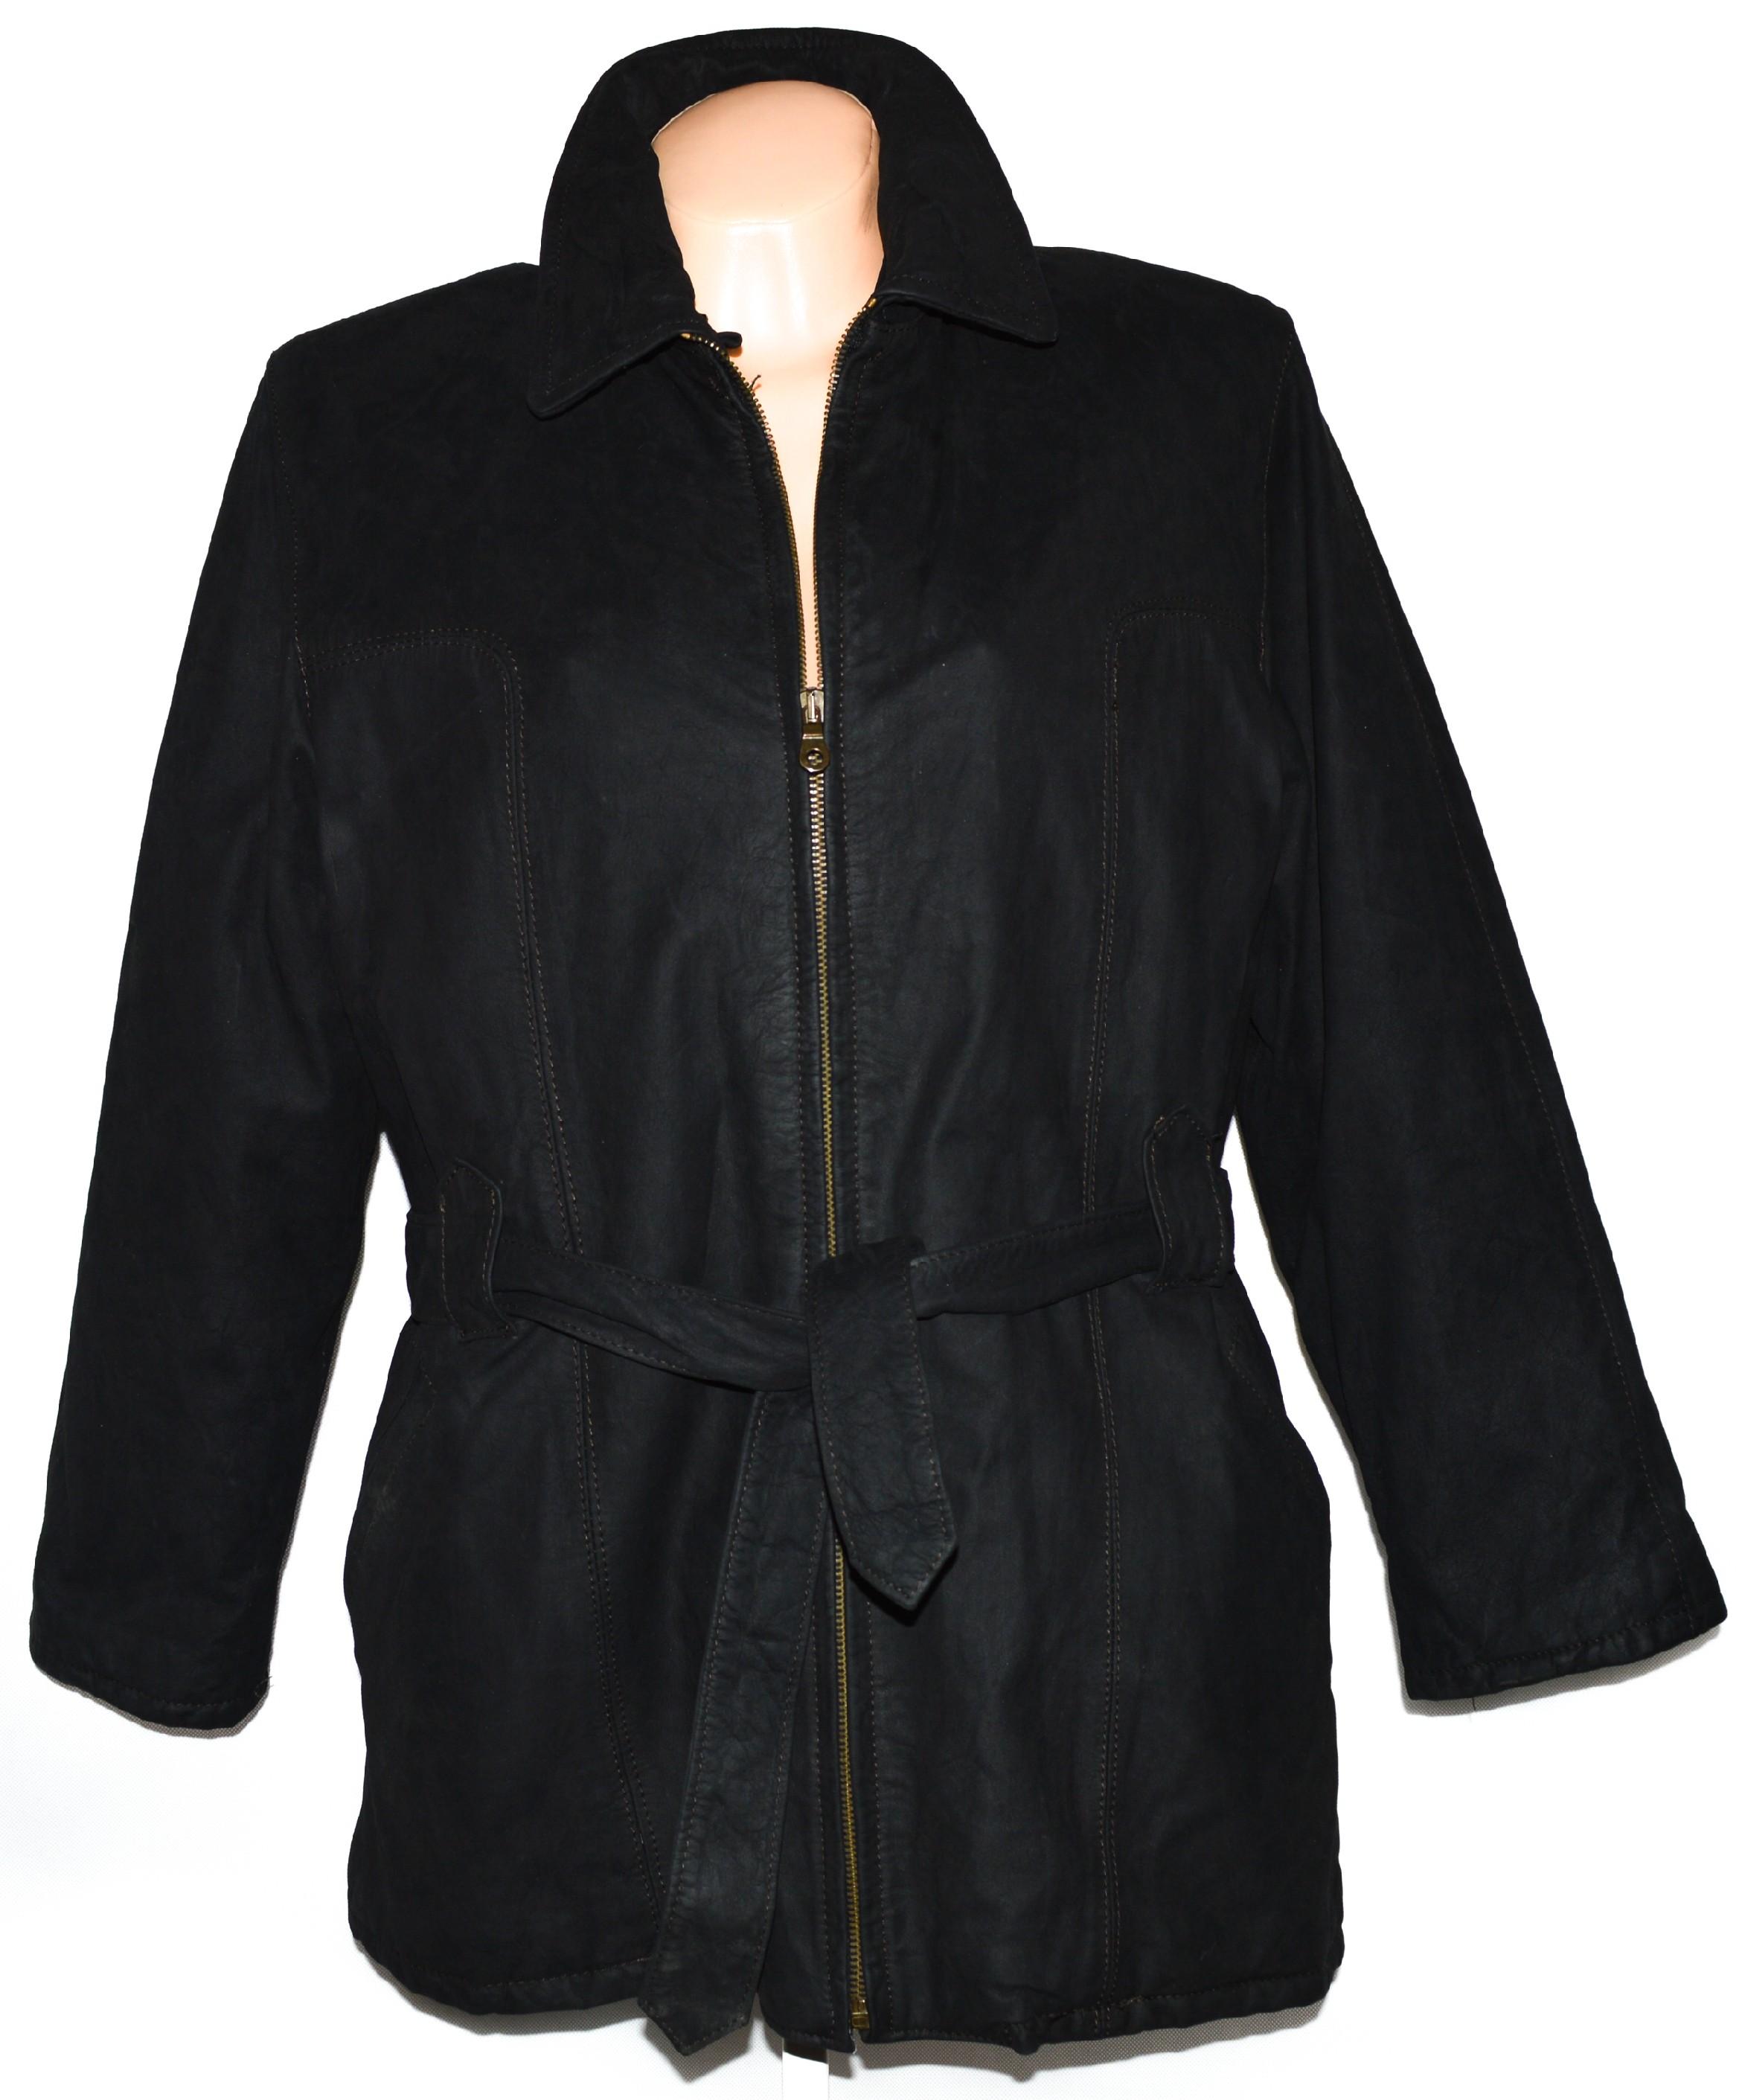 KOŽENÝ dámský hnědý měkký kabát s páskem XXL 463b28f544c